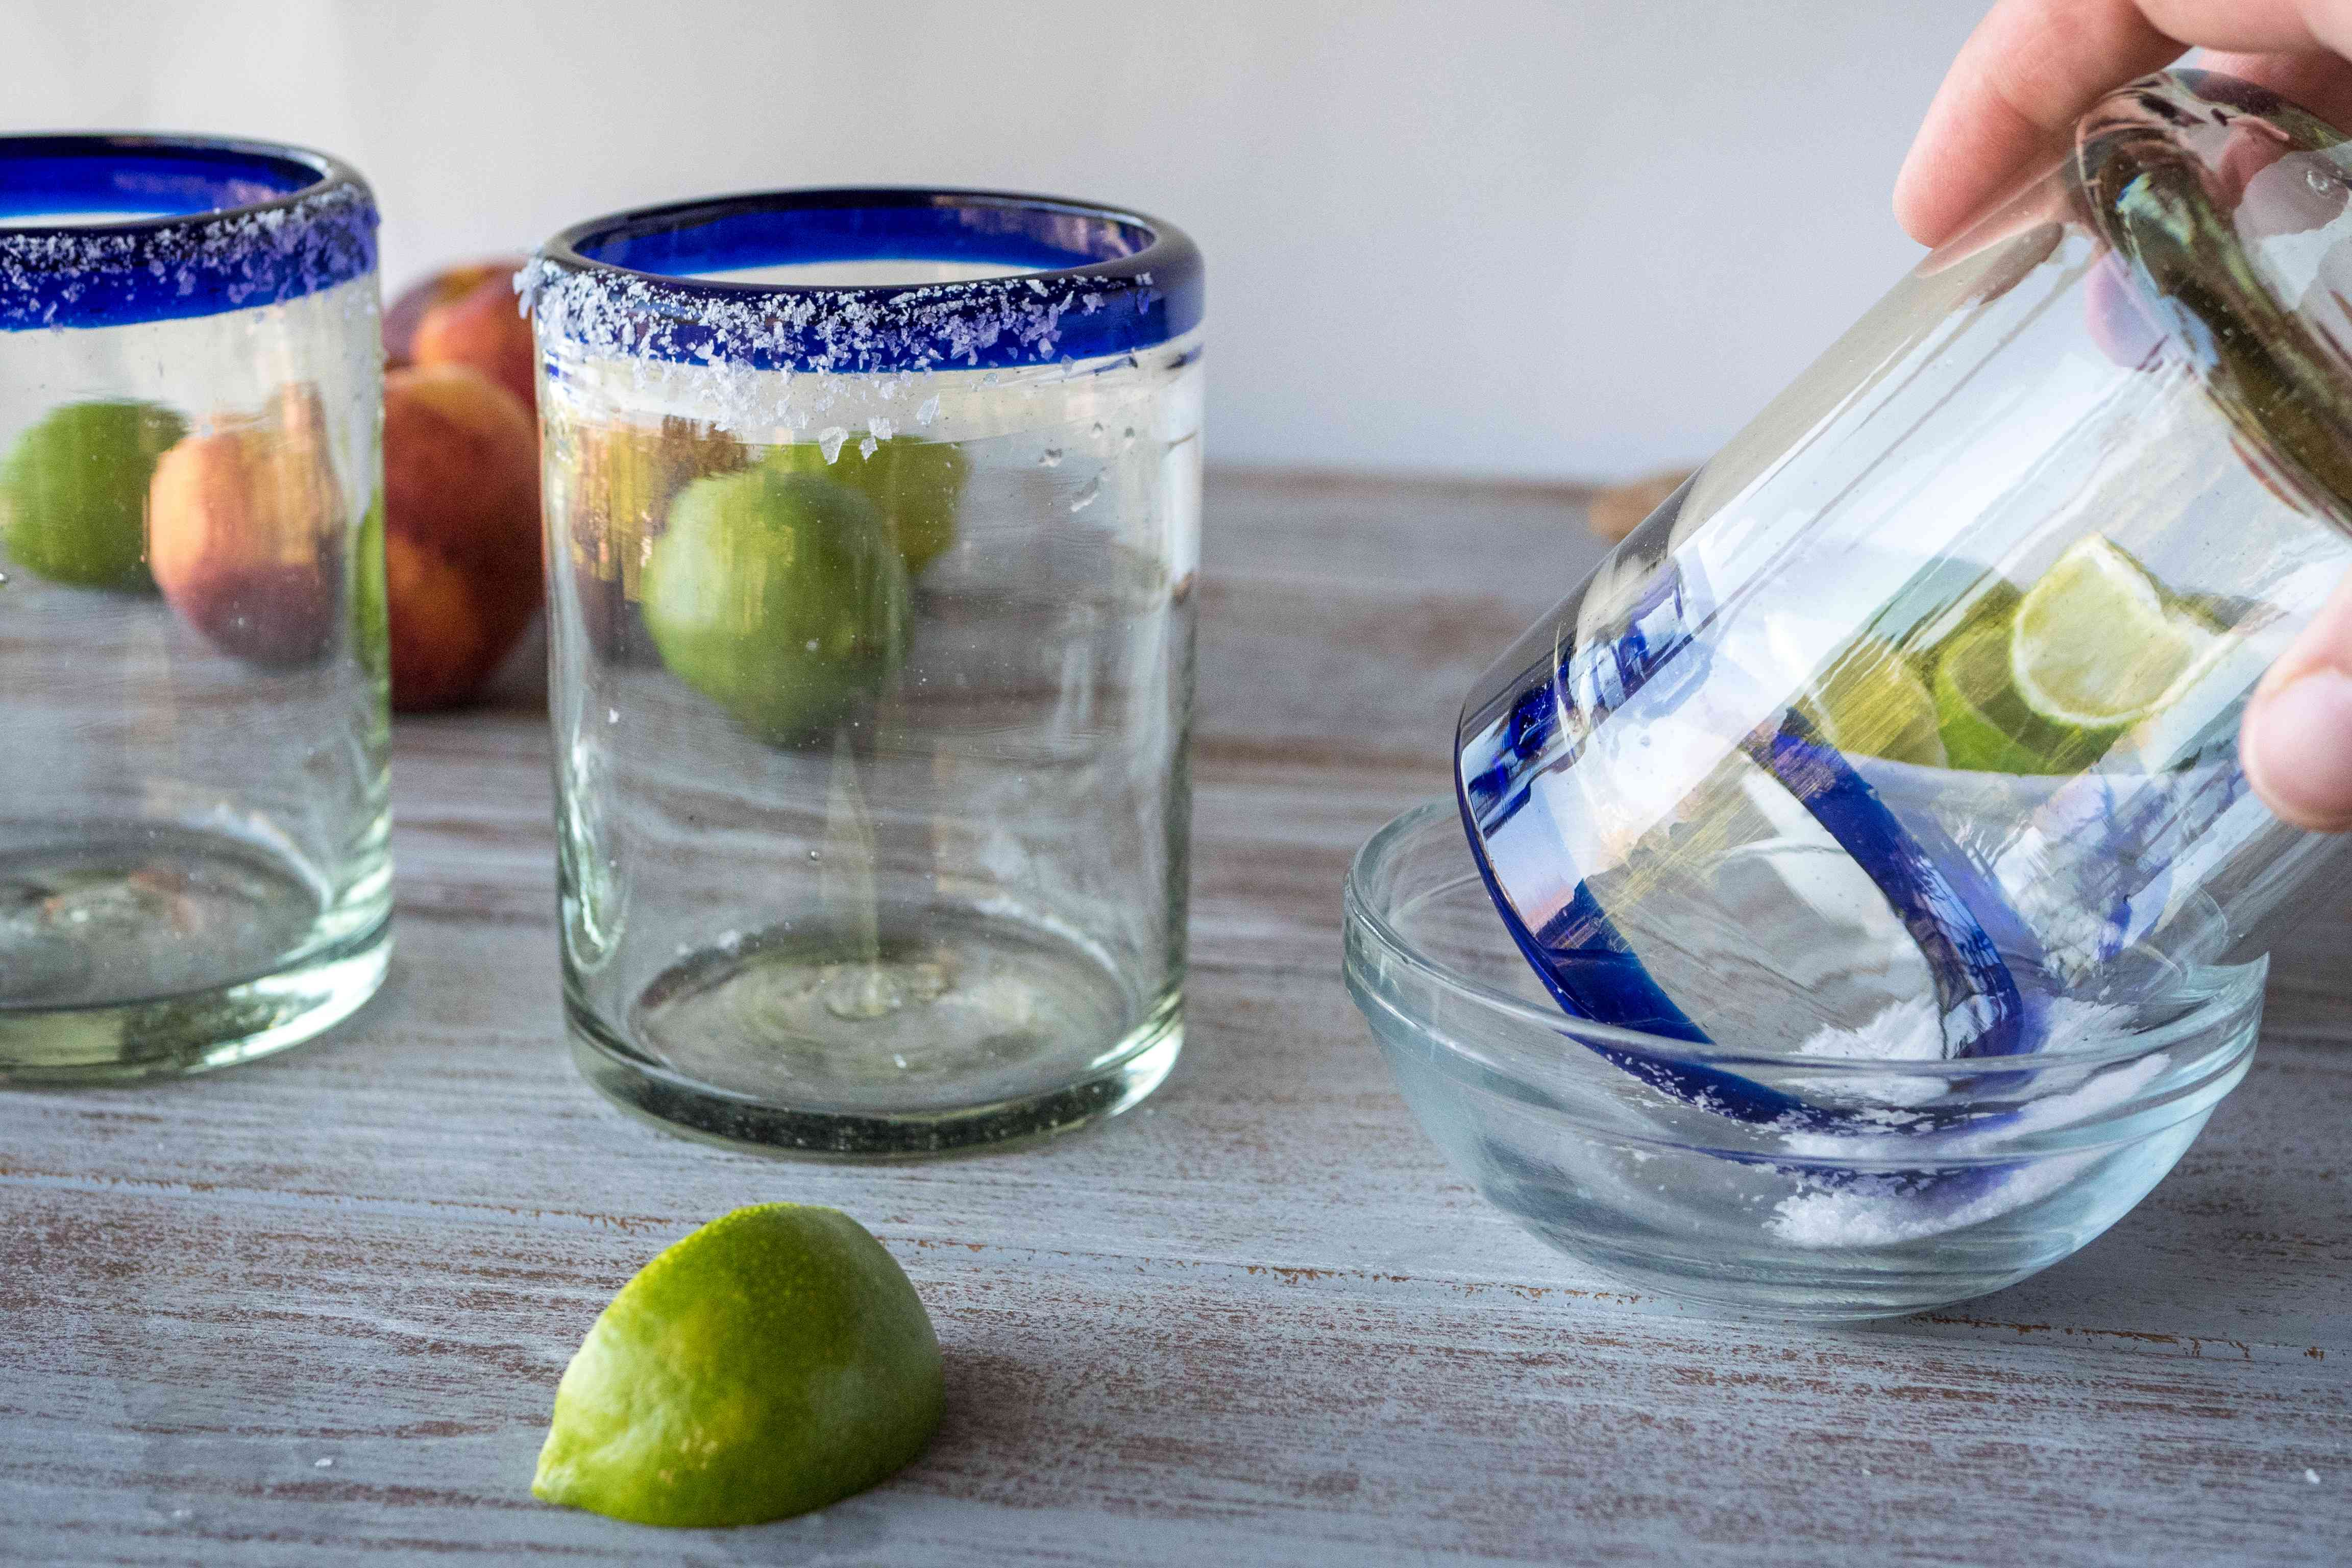 Adding salt to the rim of a glass to make margaritas.